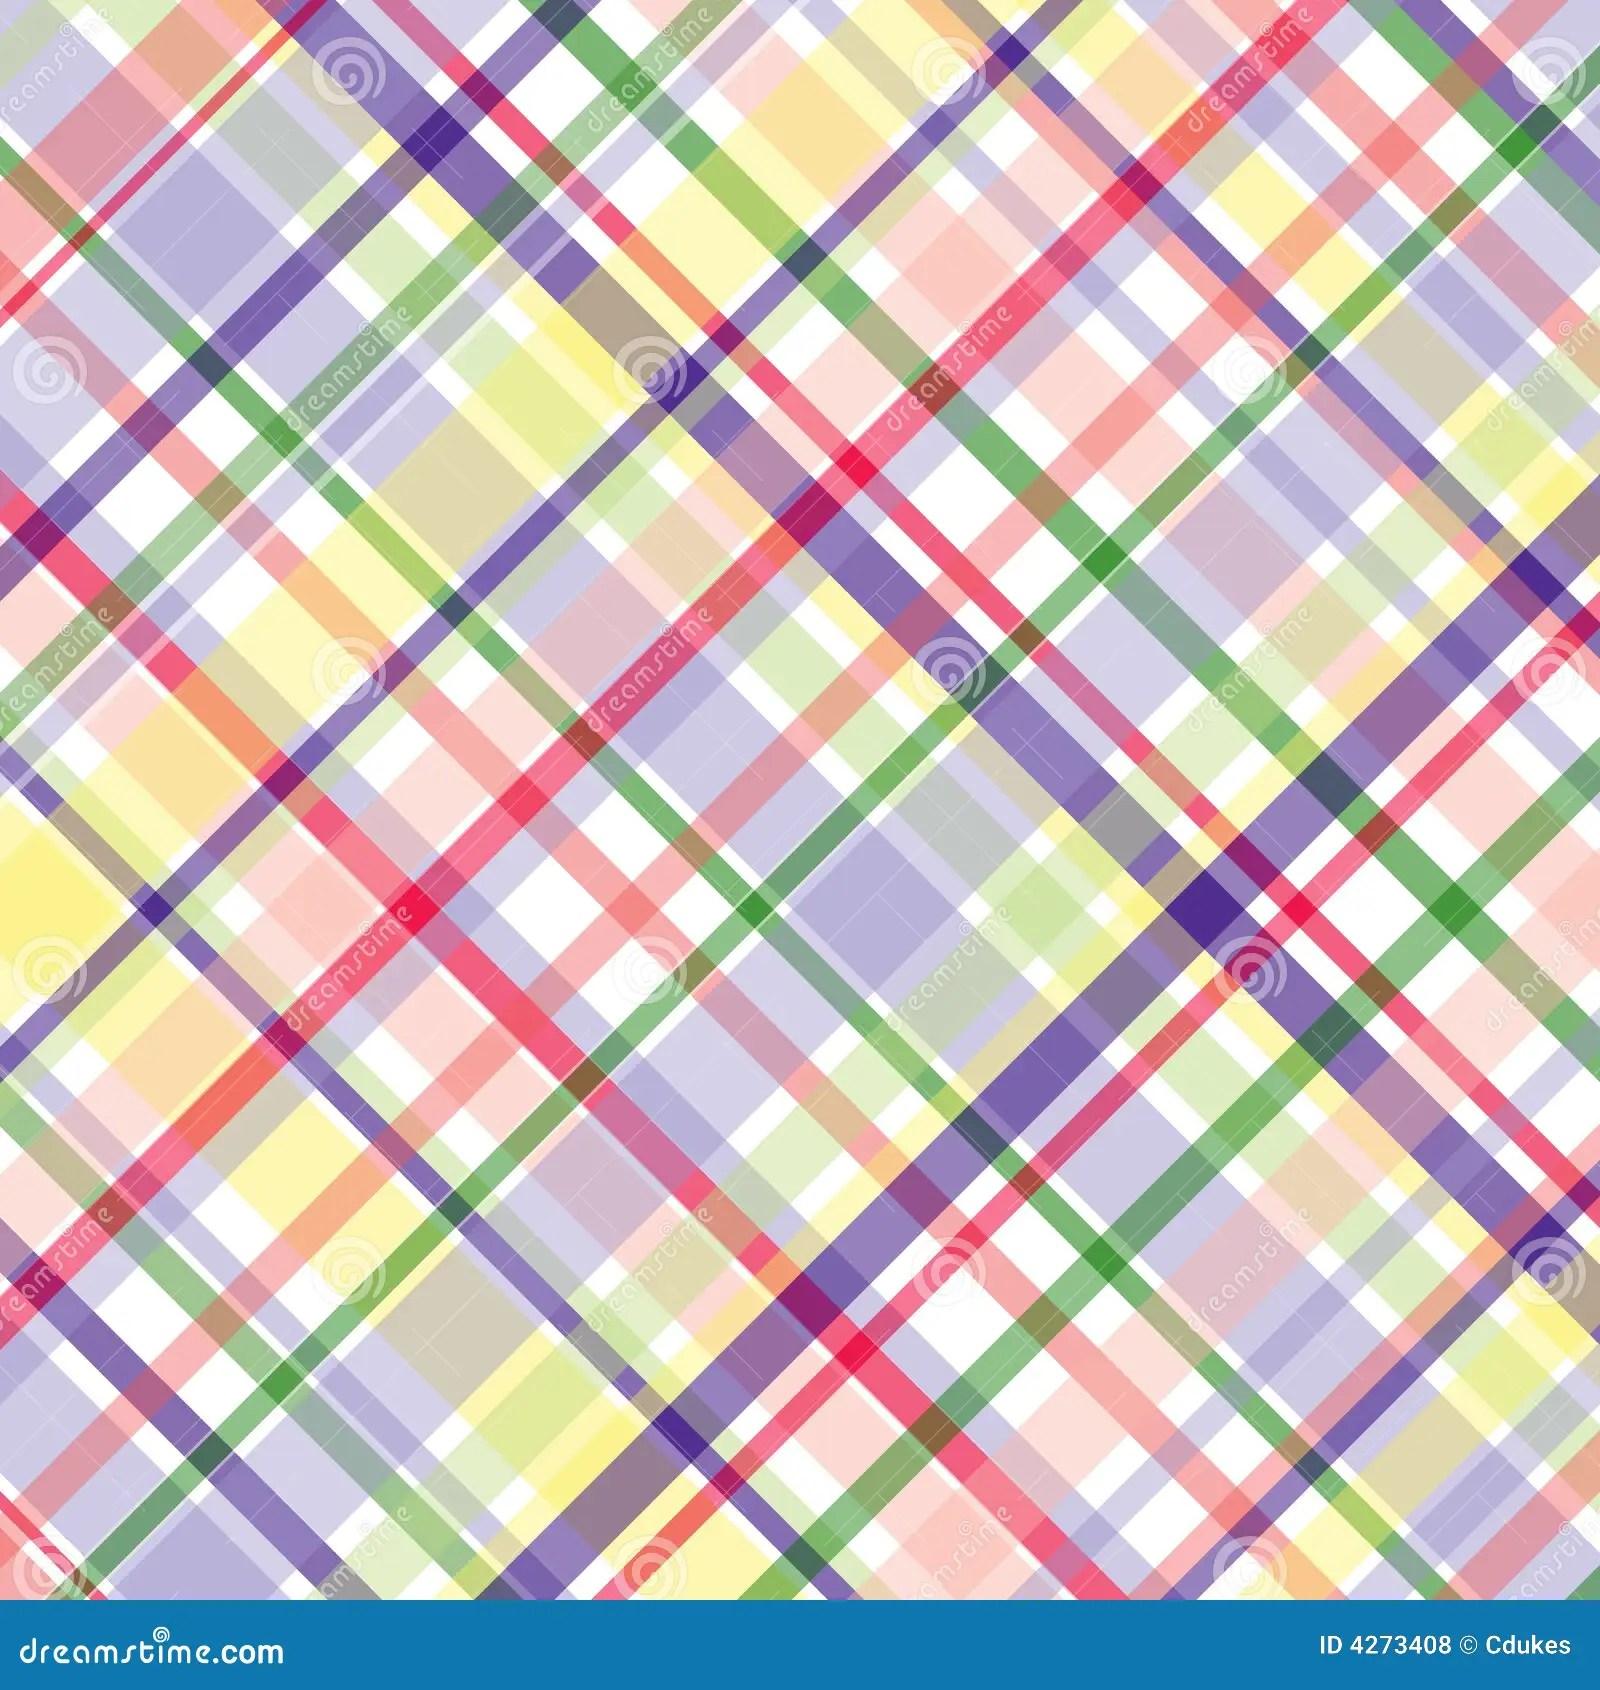 Black And White Polka Dot Wallpaper Border Pastel Plaid Royalty Free Stock Photos Image 4273408